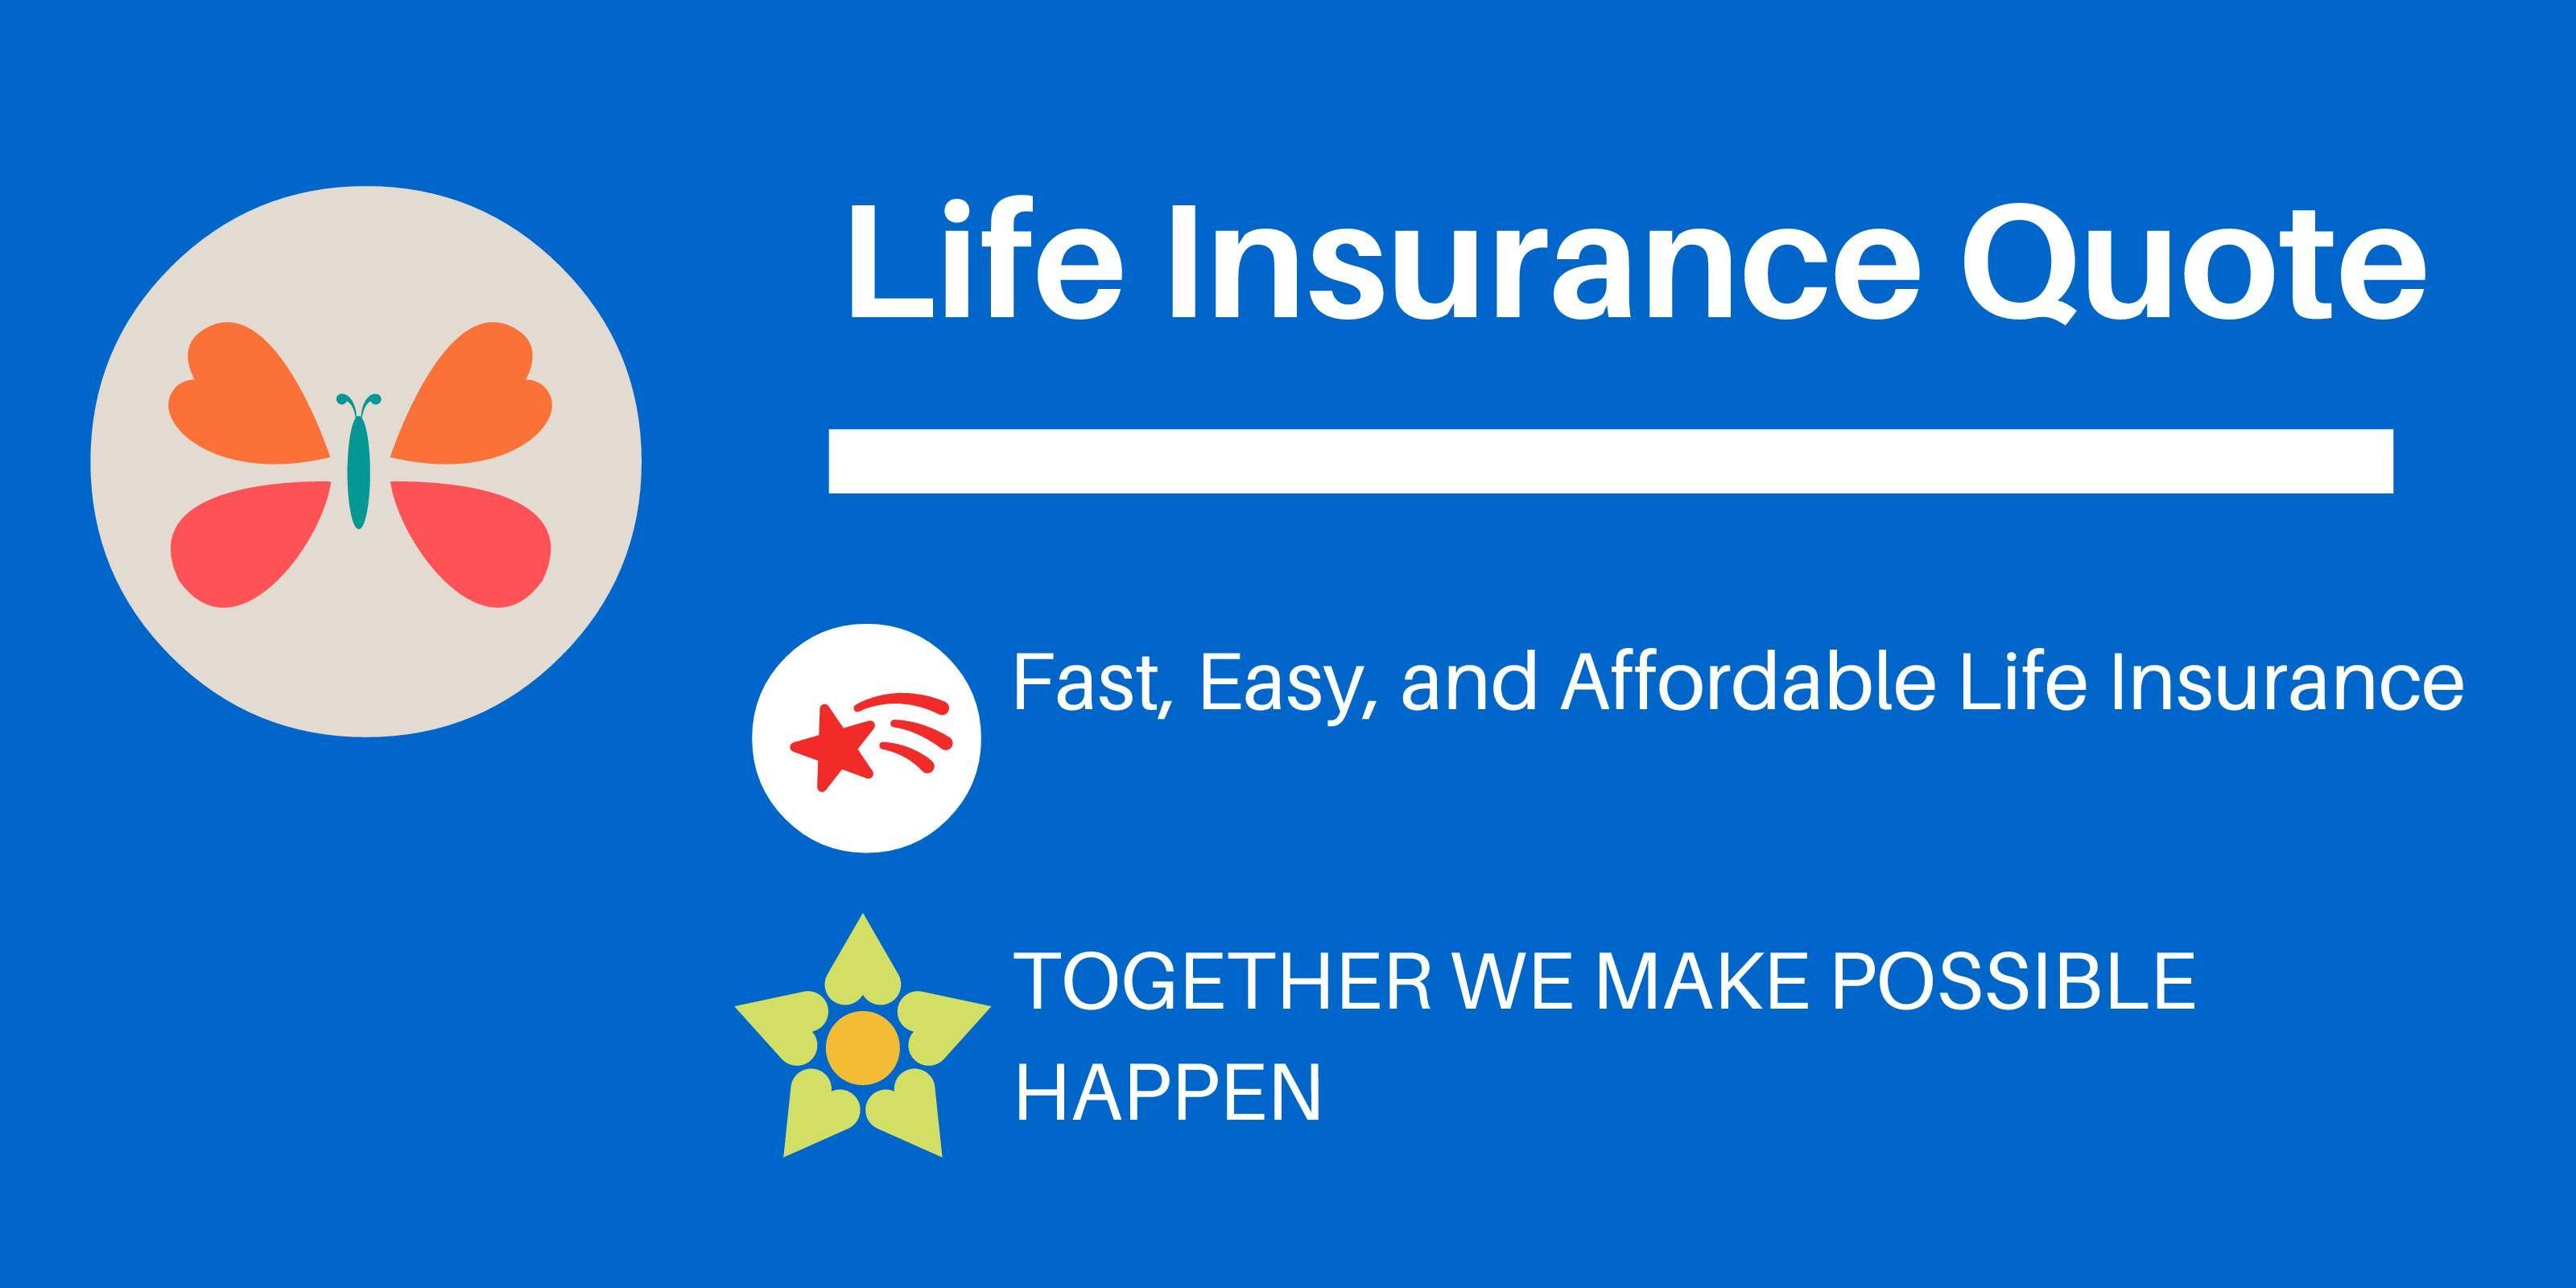 Life Insurance Quote Life Insurance Quote Life Insurance